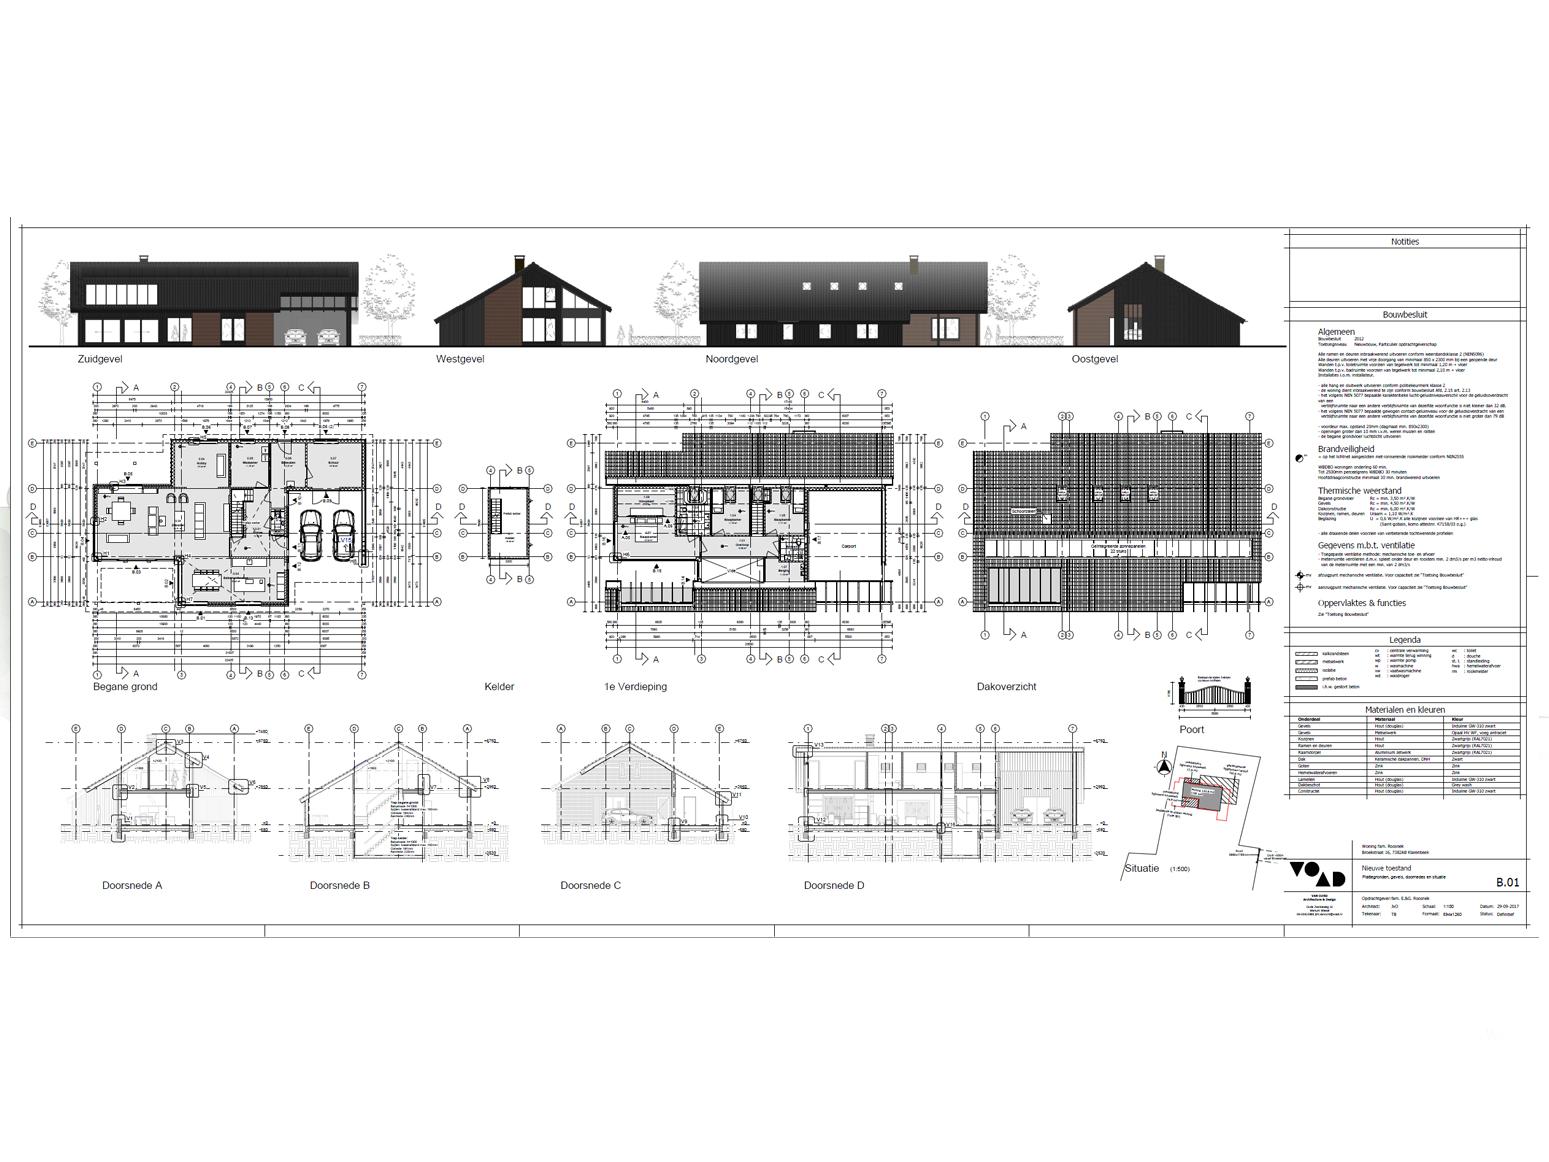 stoer-schuurwoning-klarenbeek-metselwerk-donker-van-oord-architectuur-en-design-wenum-wiesel-architect-voorst-architect-apeldoorn-4